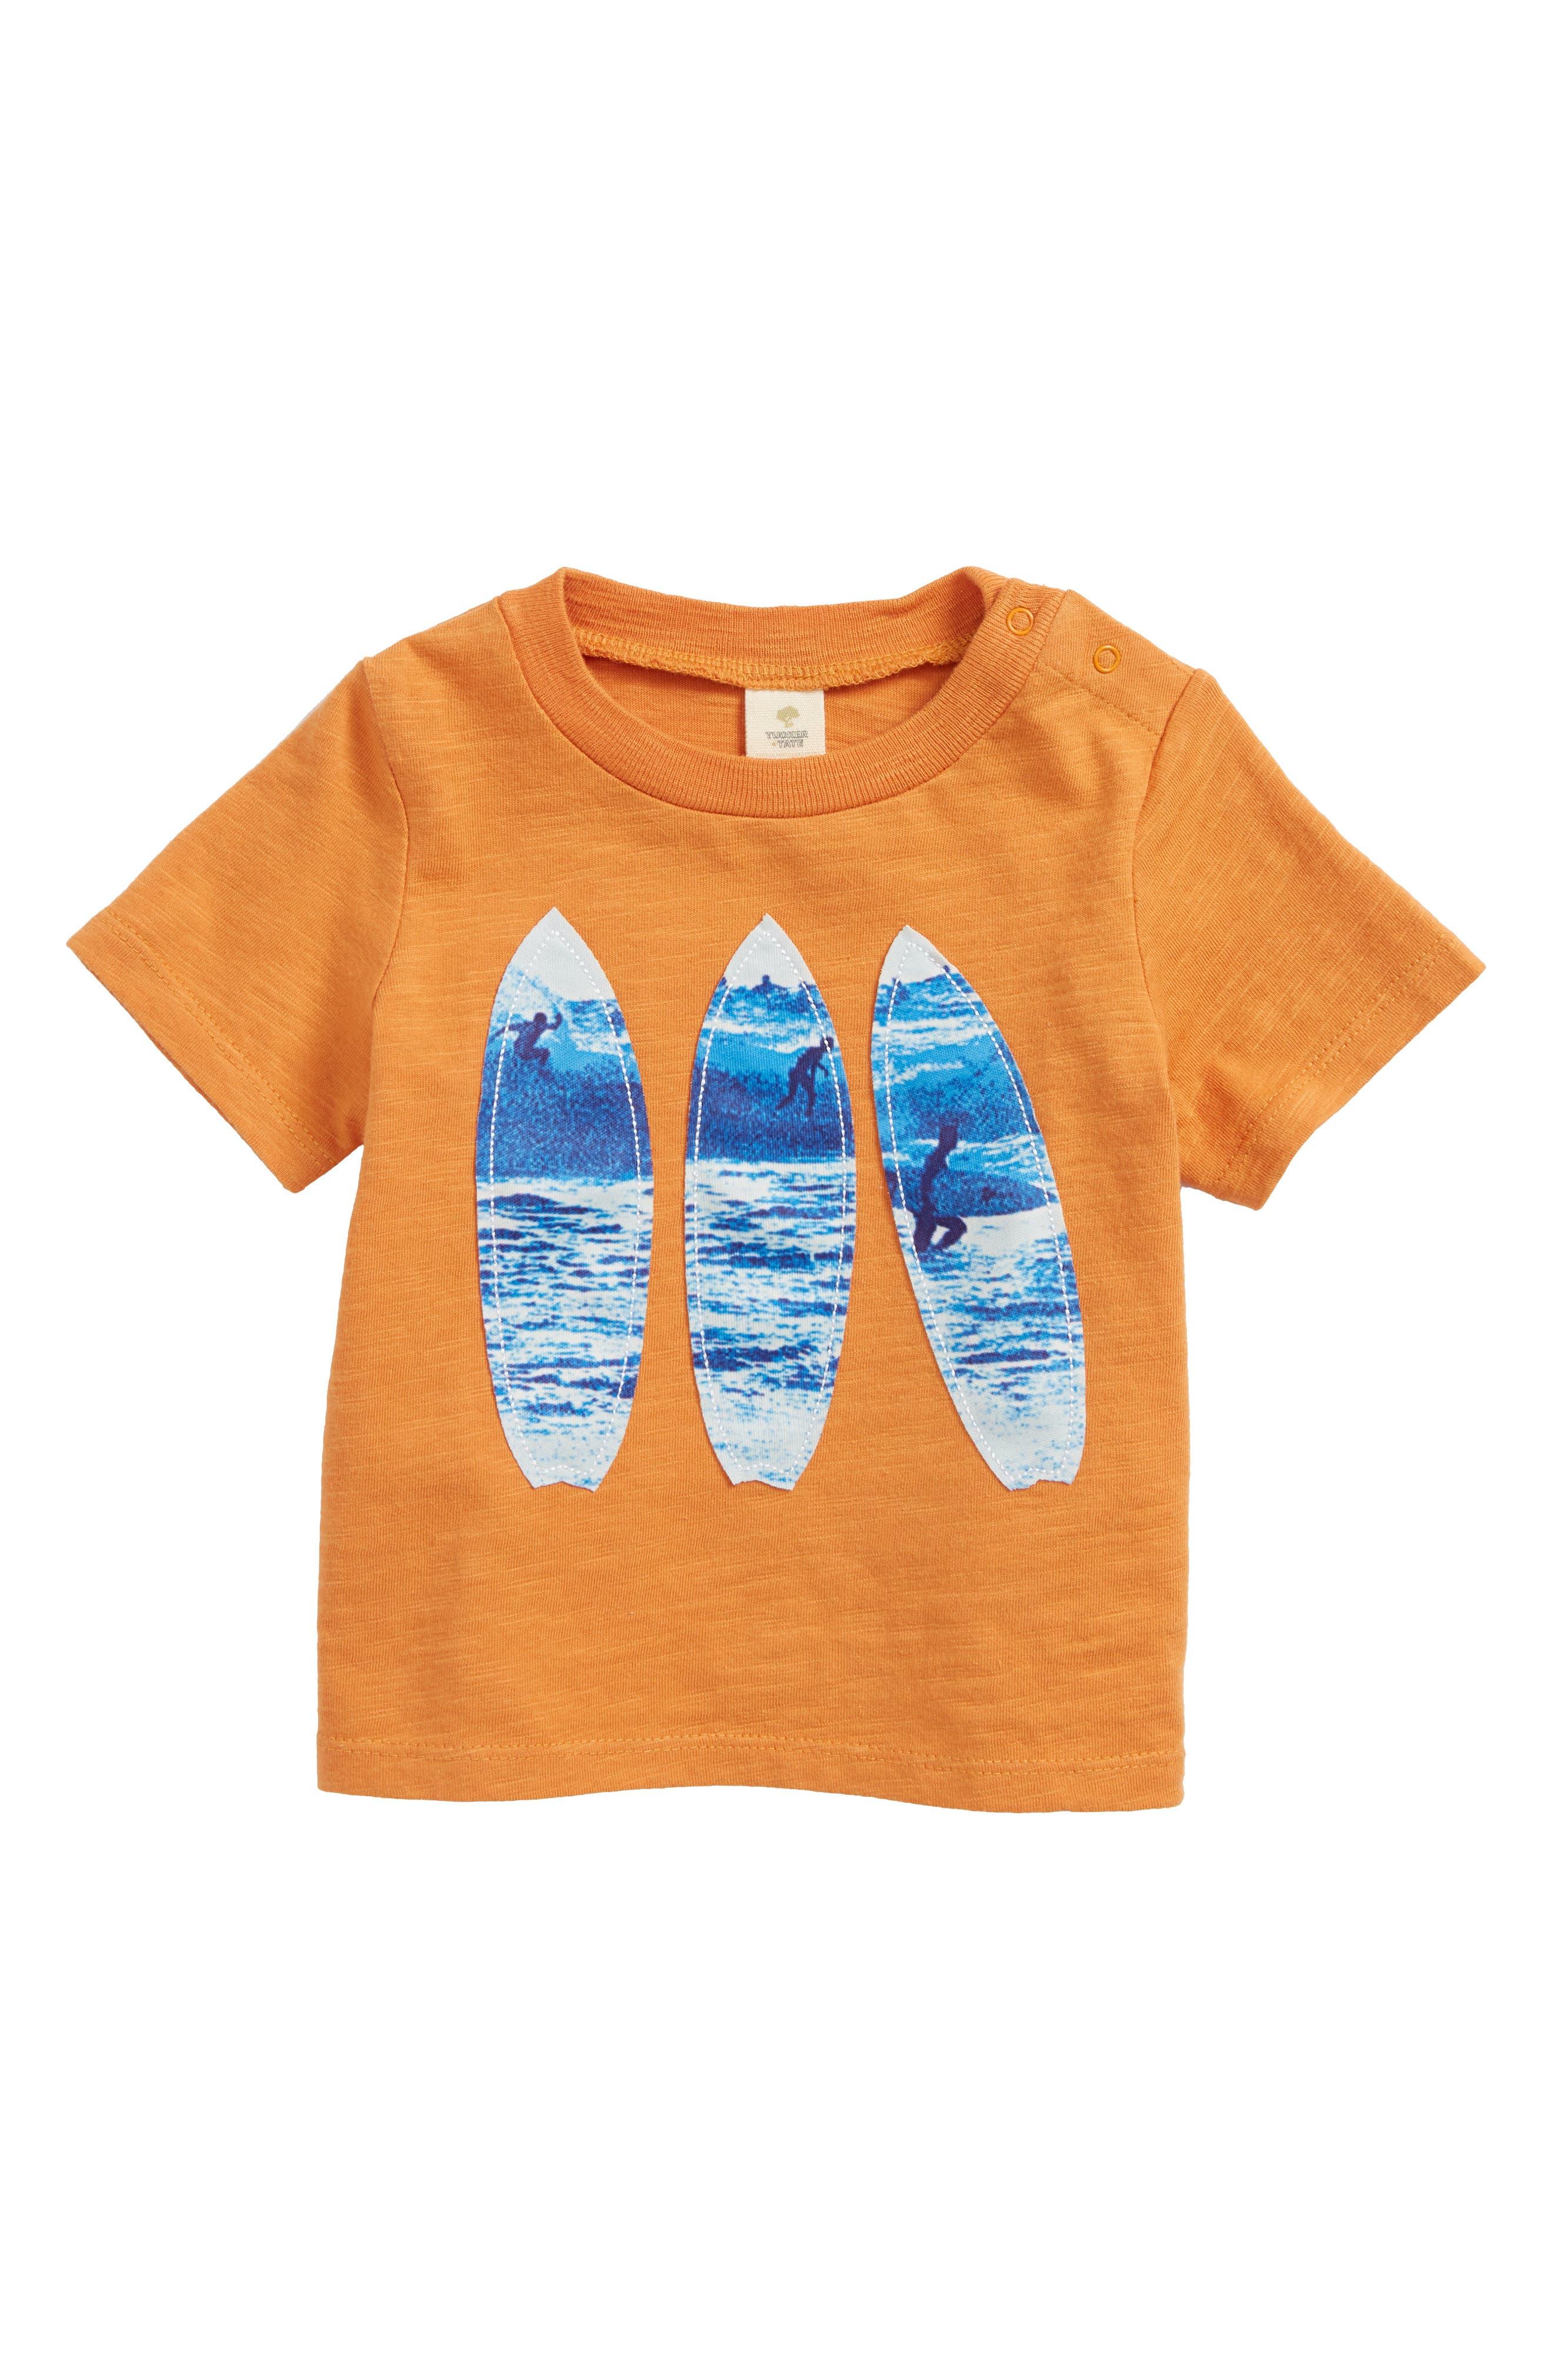 Main Image - Tucker + Tate Surfboard Appliqué T-Shirt (Baby)